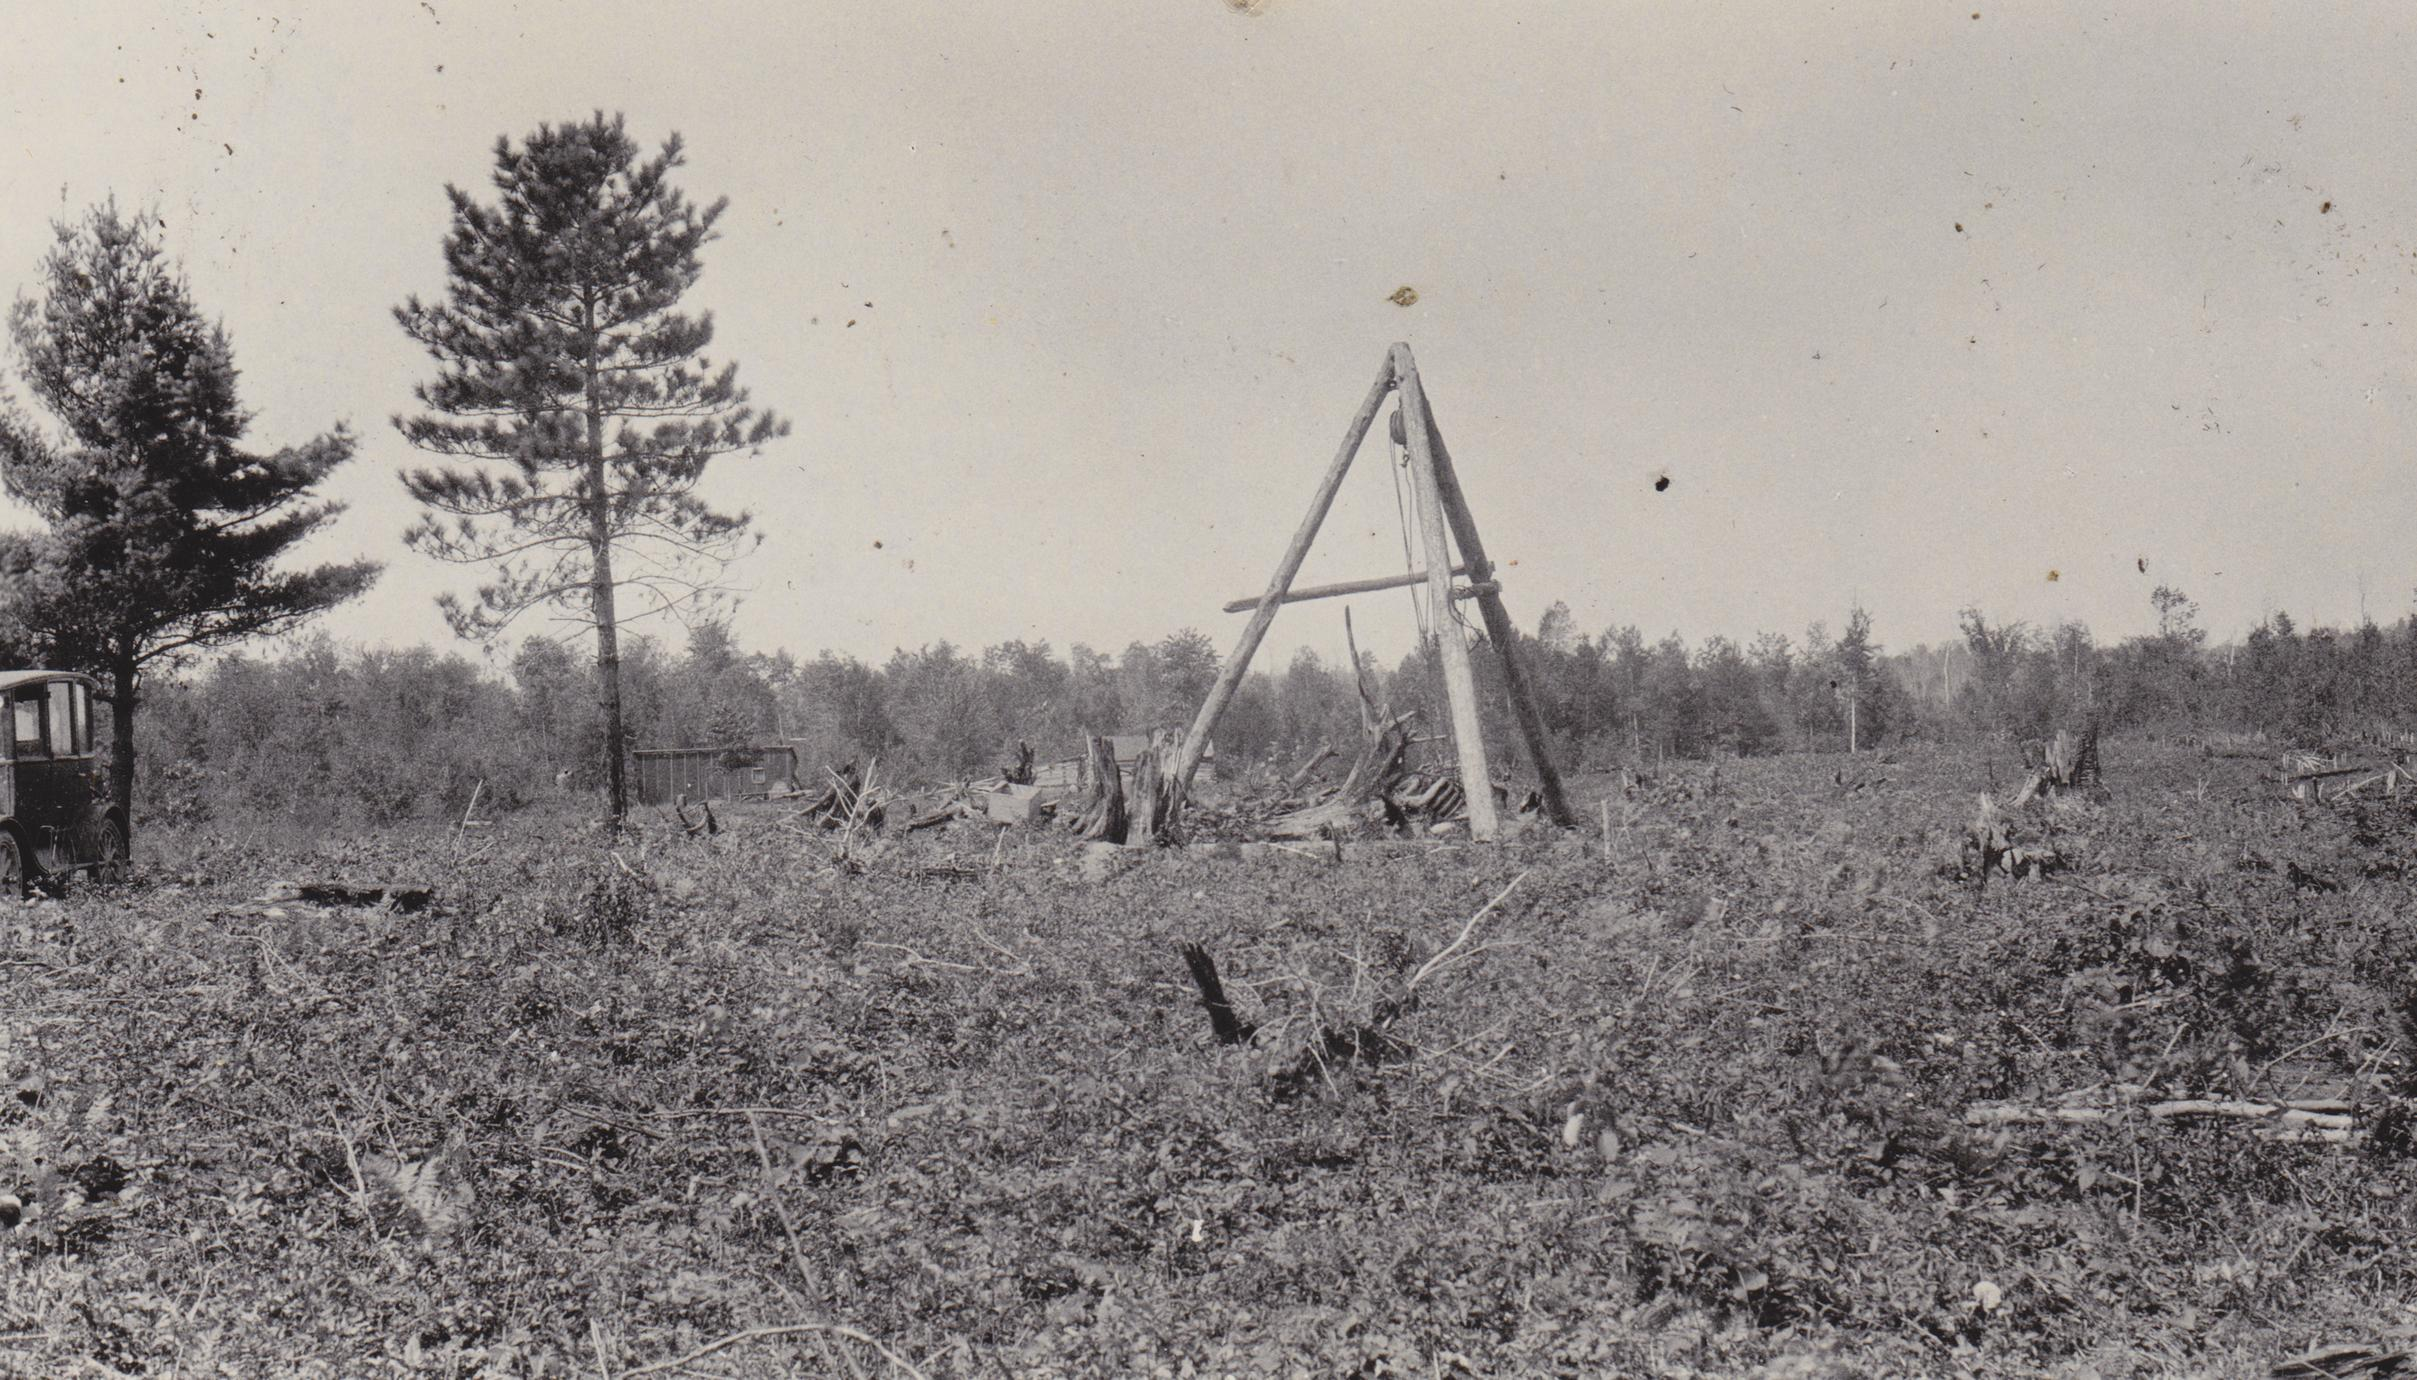 Dynamite stump puller